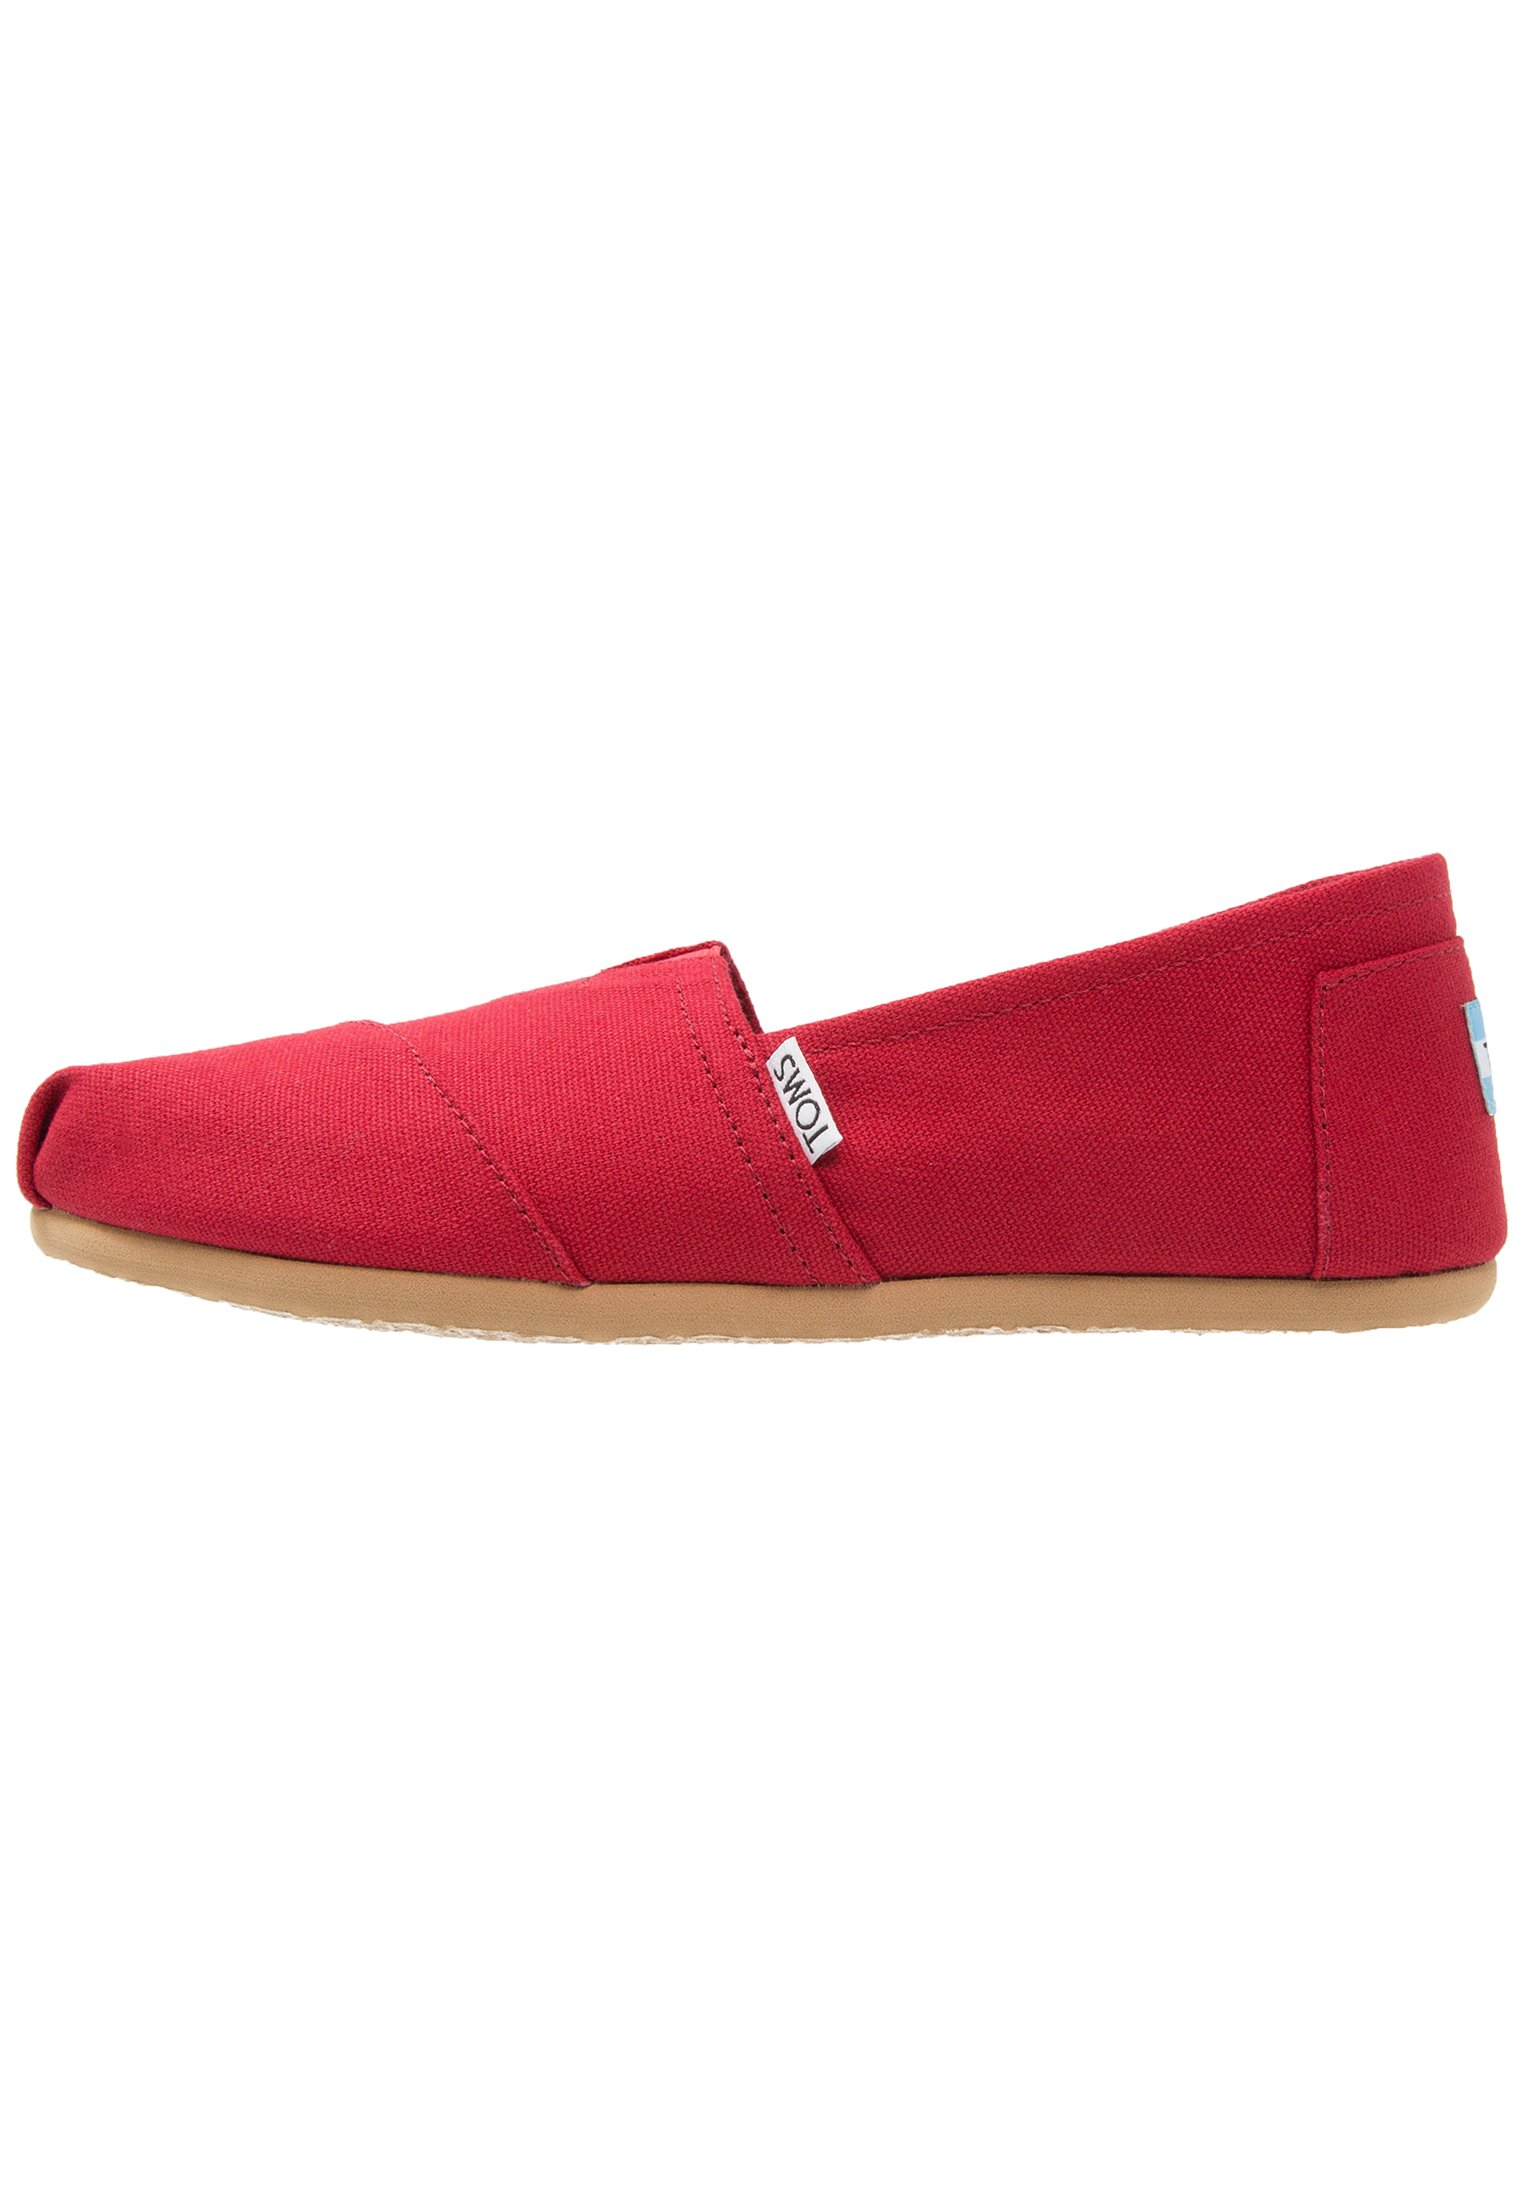 Women Slip-ons - red